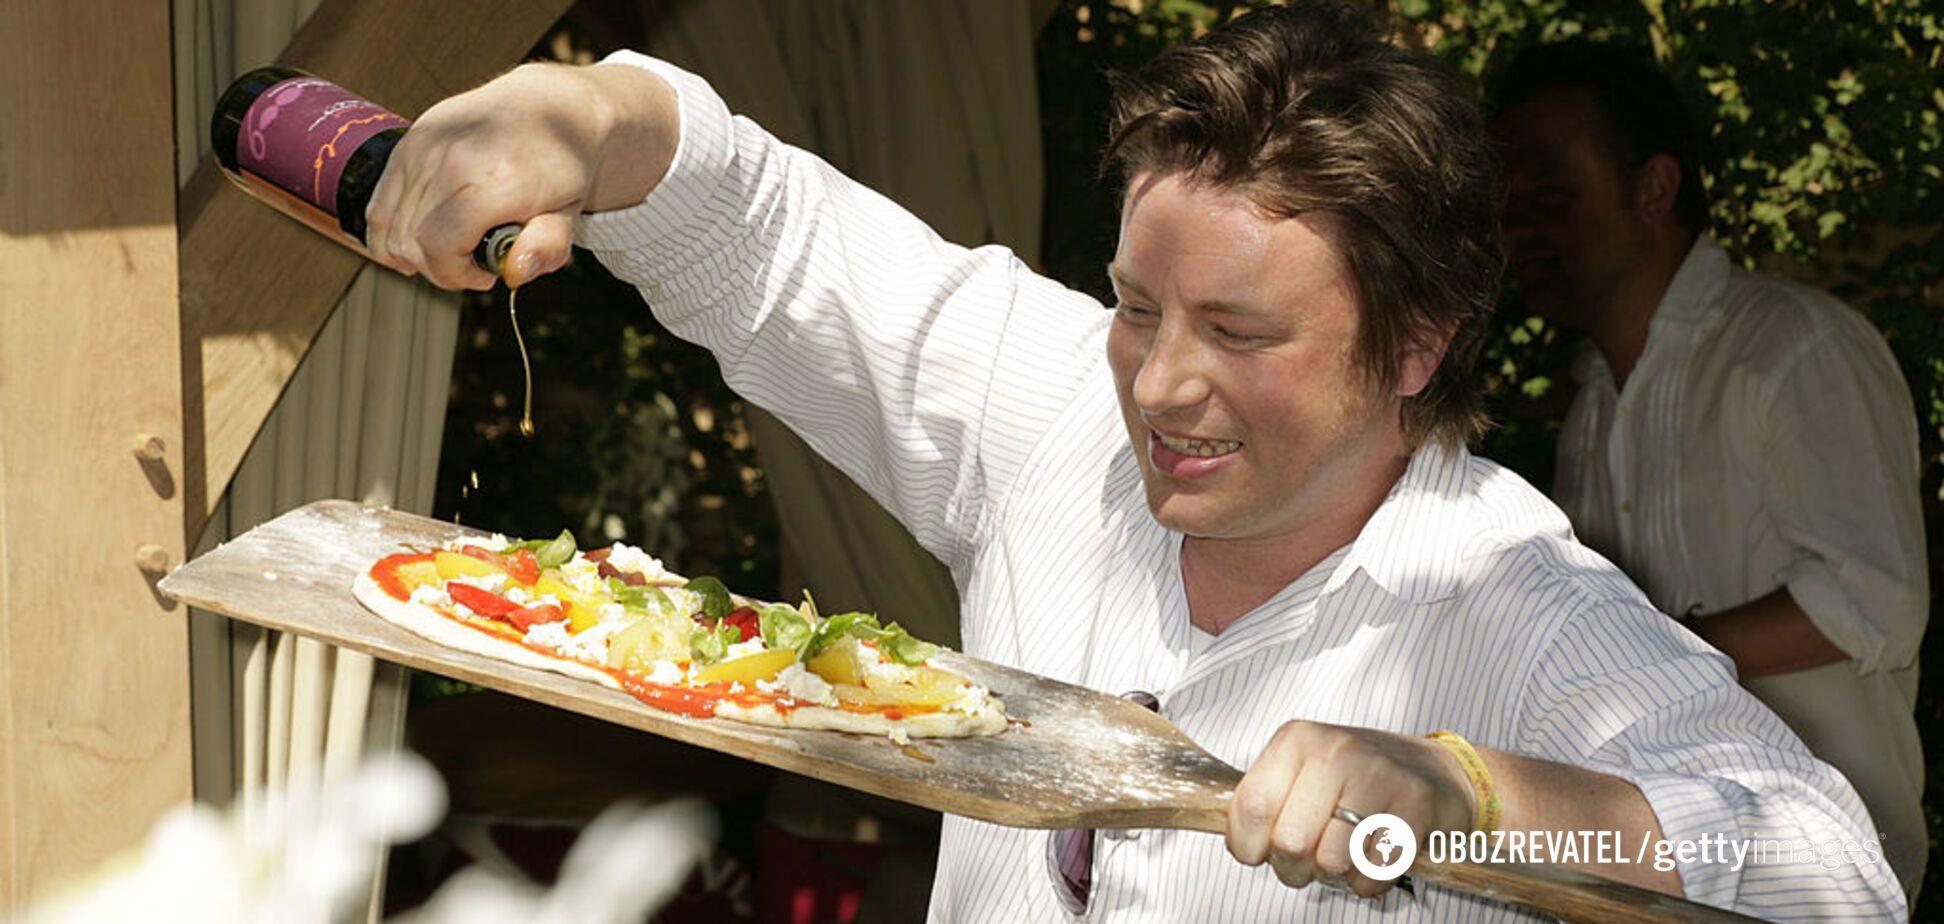 Три рецепта к Дню отца от мировой звезды кулинарии Джейми Оливера